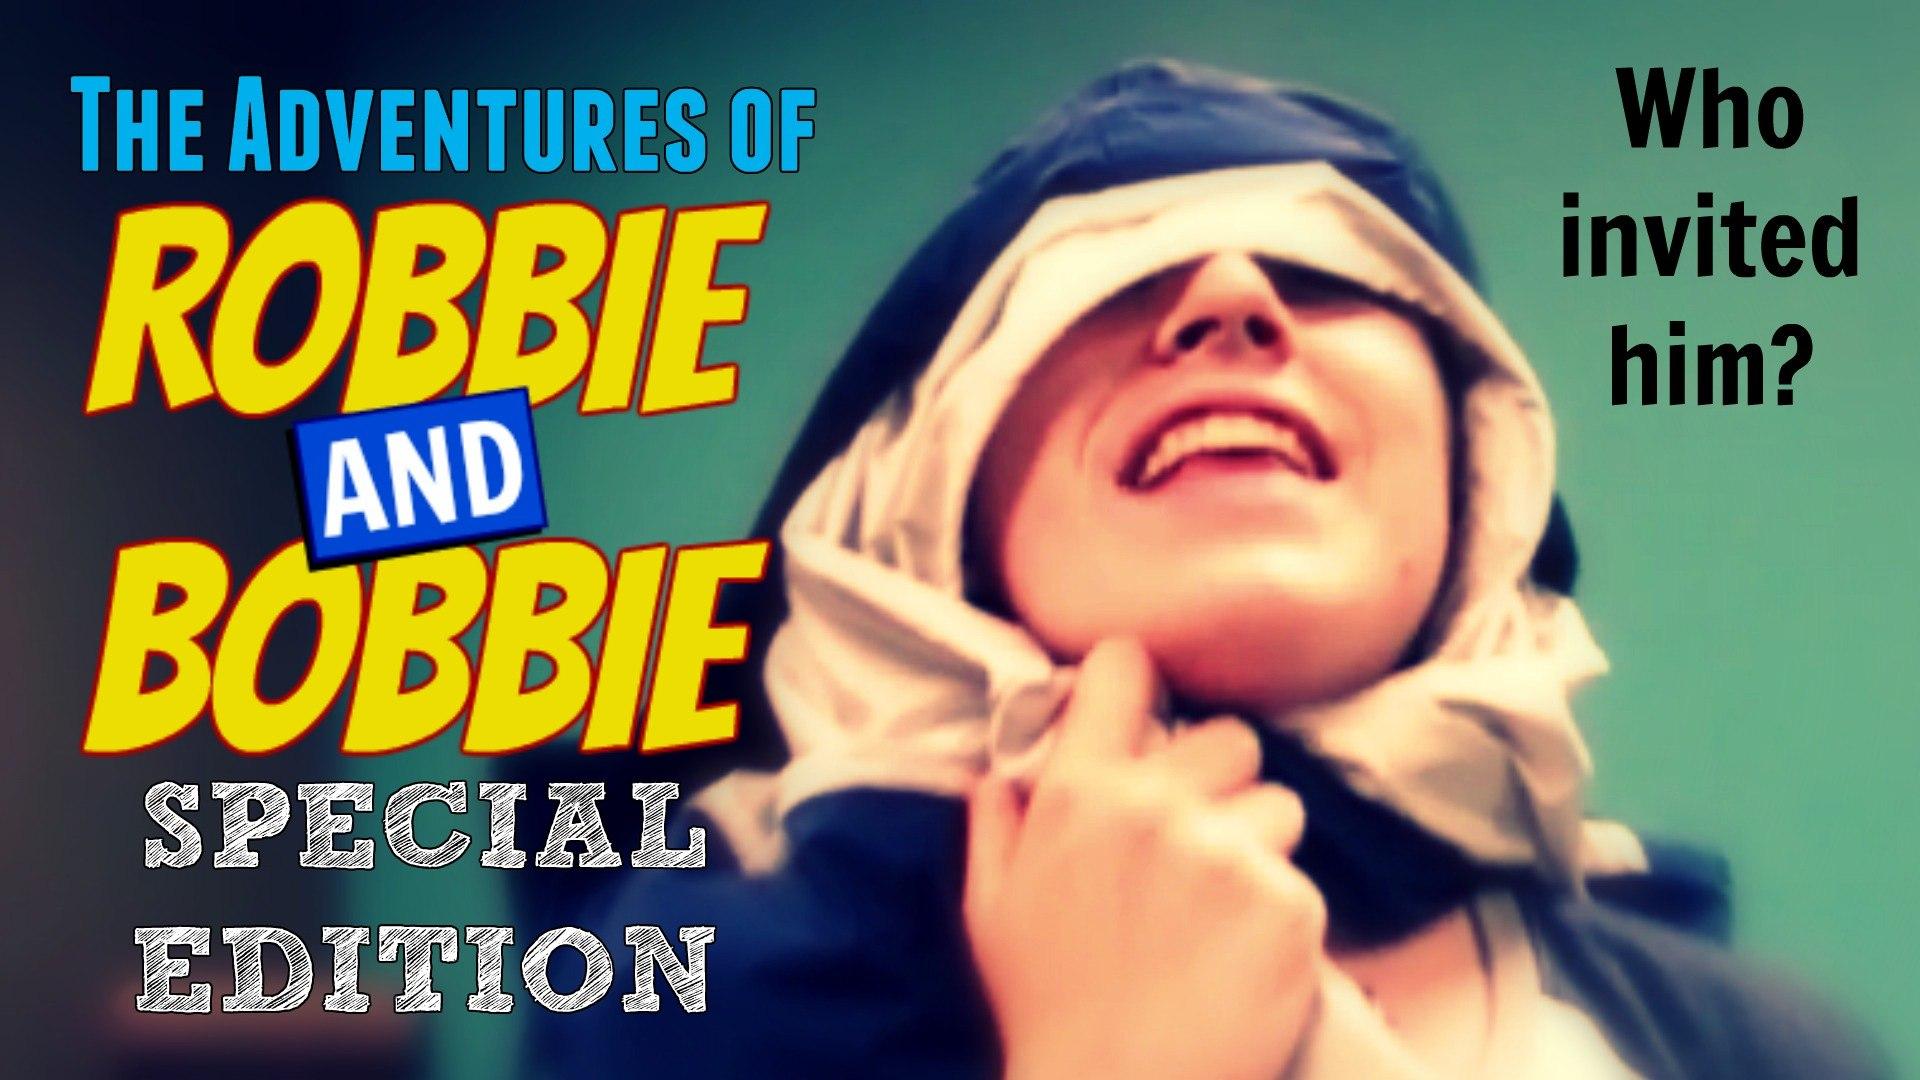 The Adventures of Robbie & Bobbie (Pilot Episeode) (Special Edition)